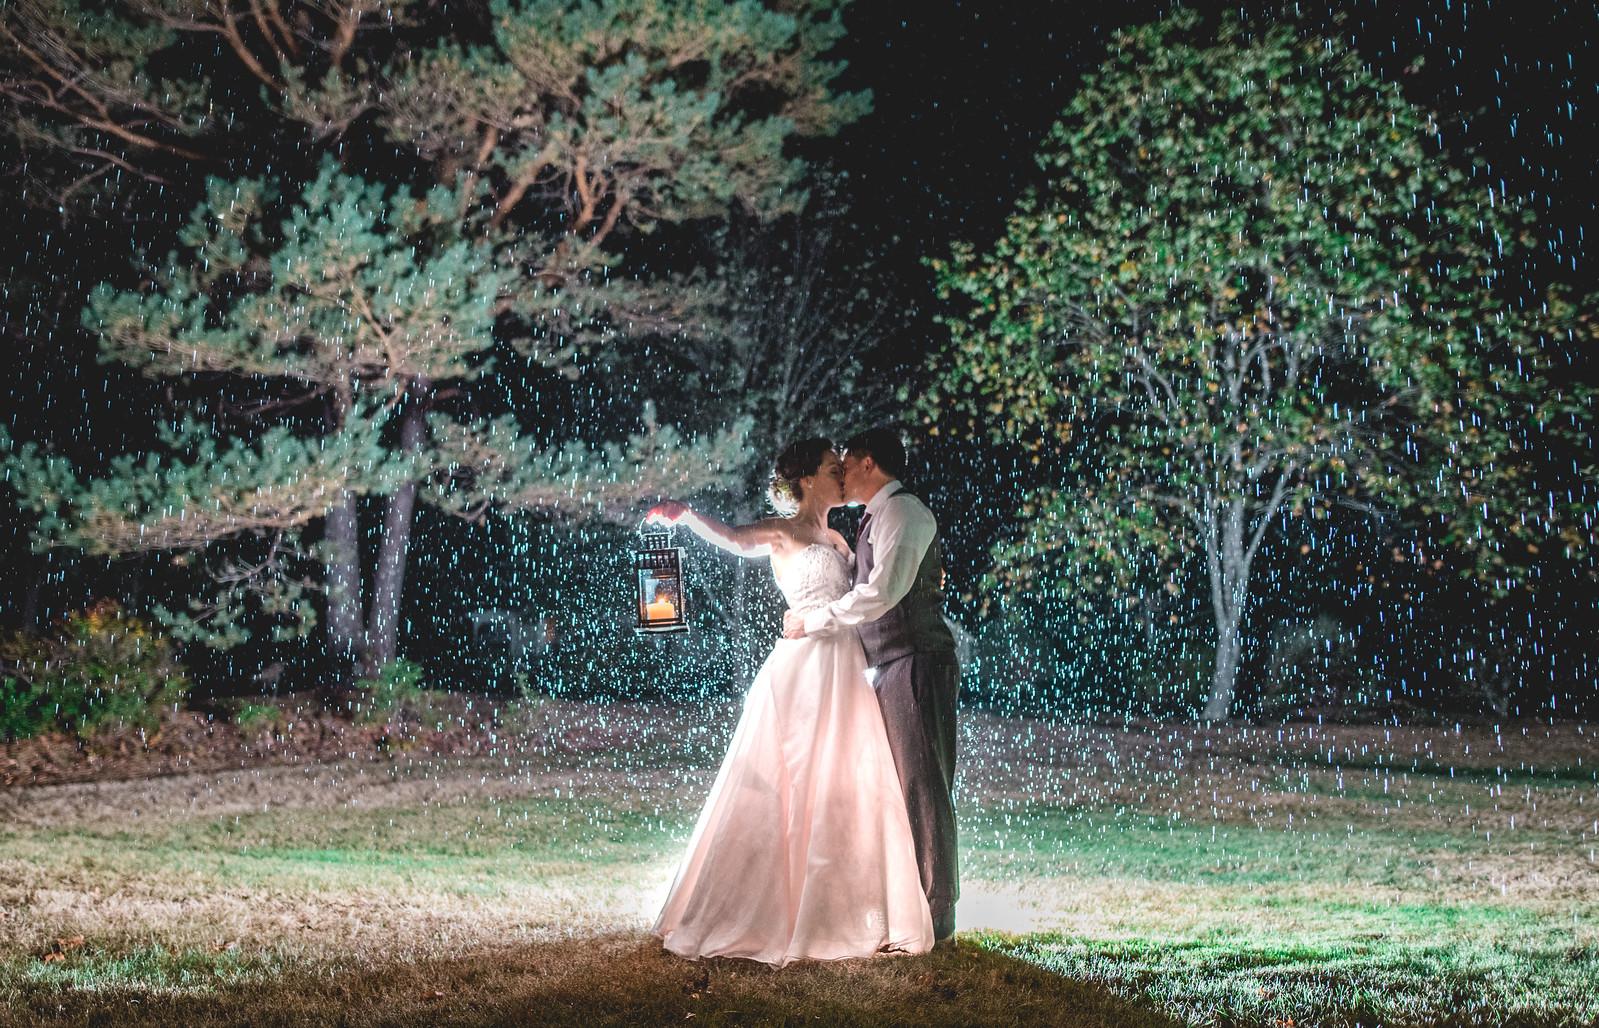 stunning kiss in the rain wedding photography